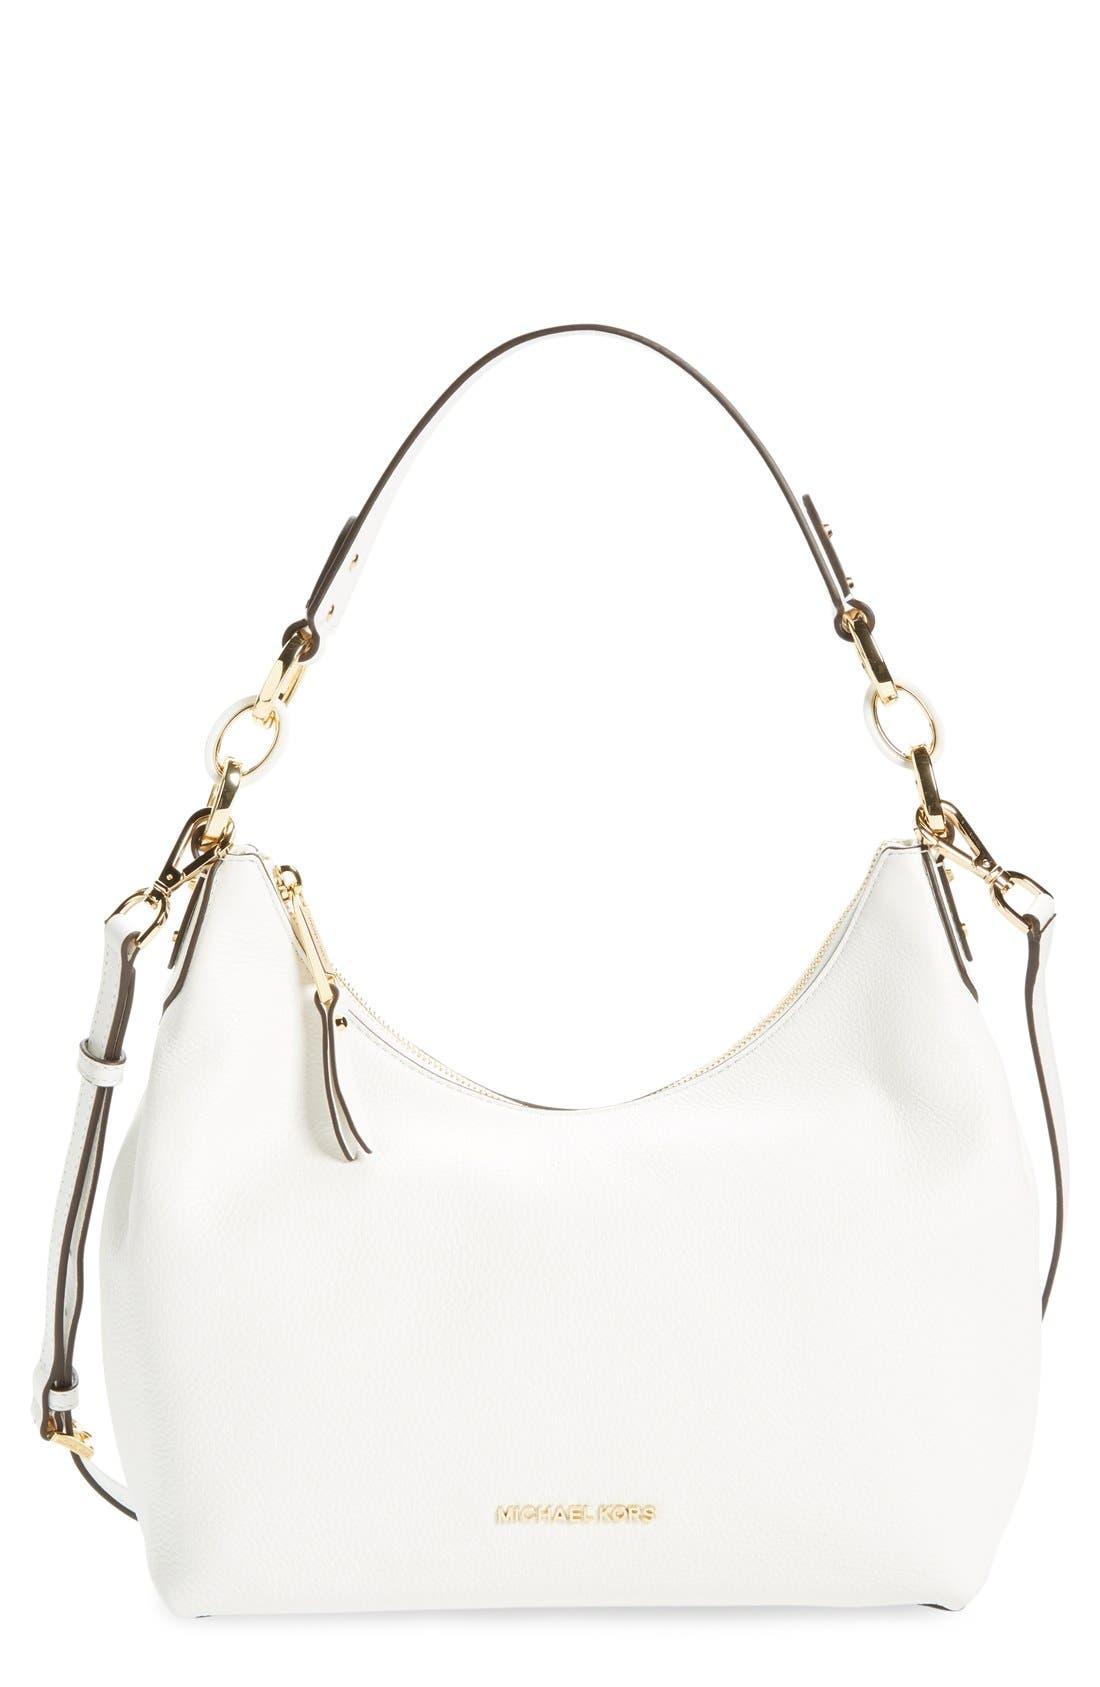 Alternate Image 1 Selected - MICHAEL Michael Kors 'Medium Isabella' Convertible Leather Shoulder Bag